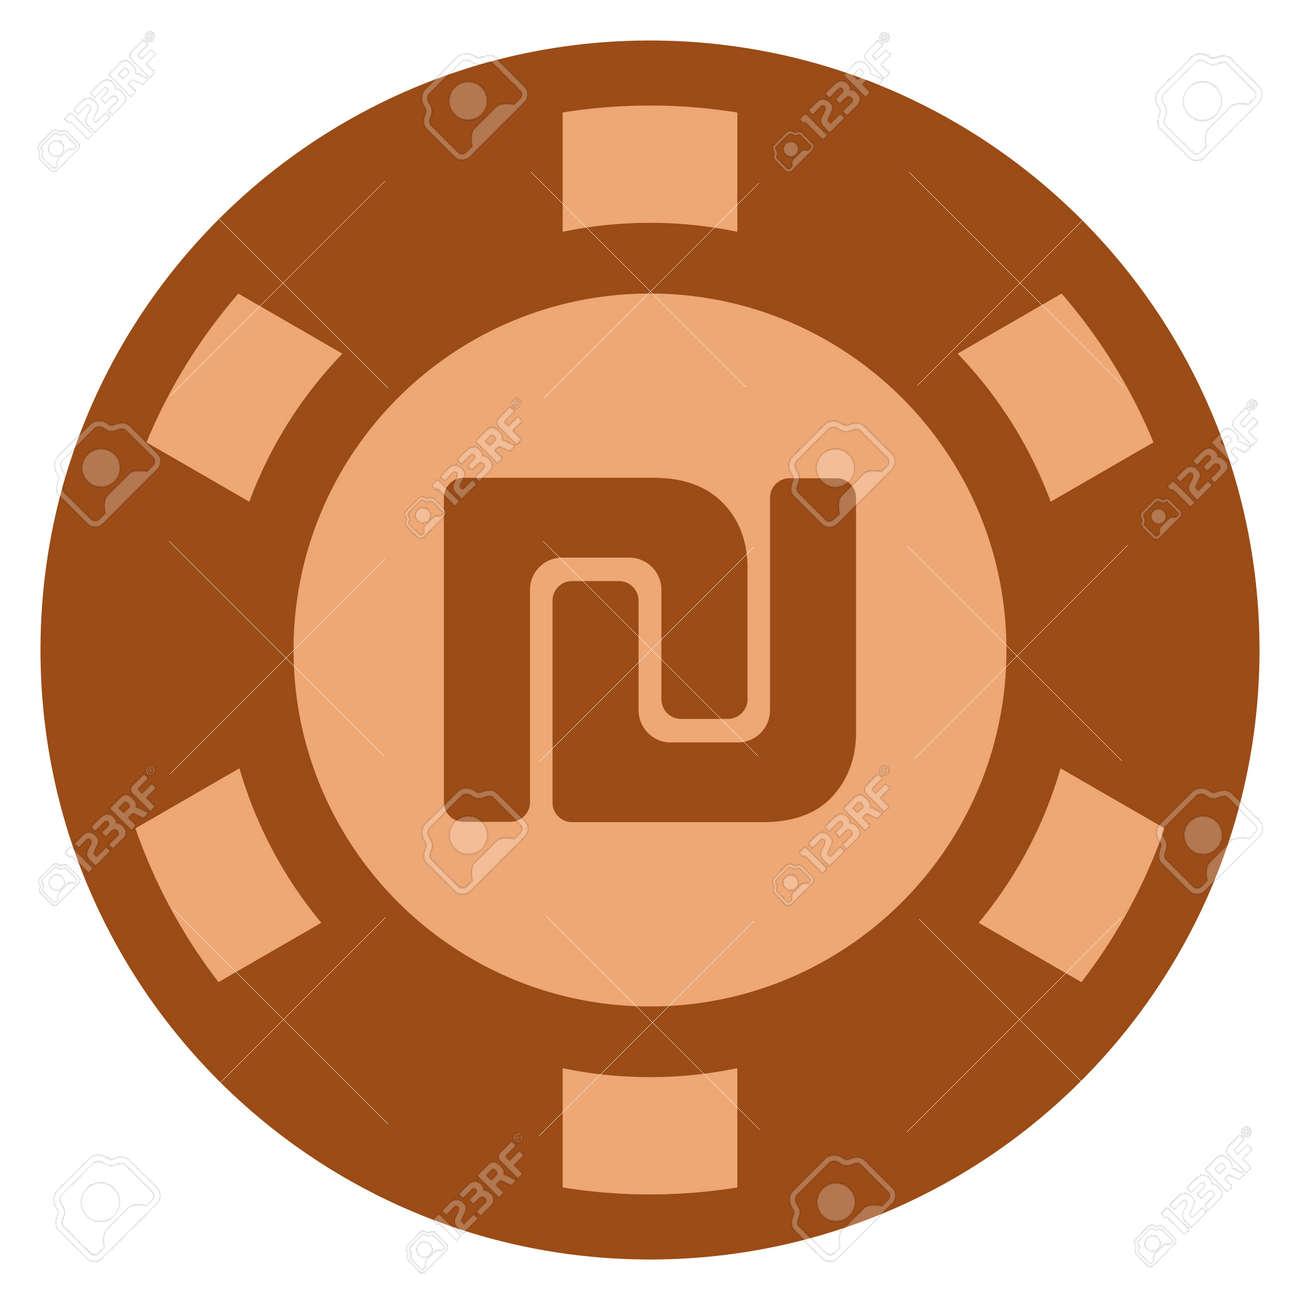 Shekel bronze casino chip pictogram raster style is a copper shekel bronze casino chip pictogram raster style is a copper flat gambling token symbol buycottarizona Image collections